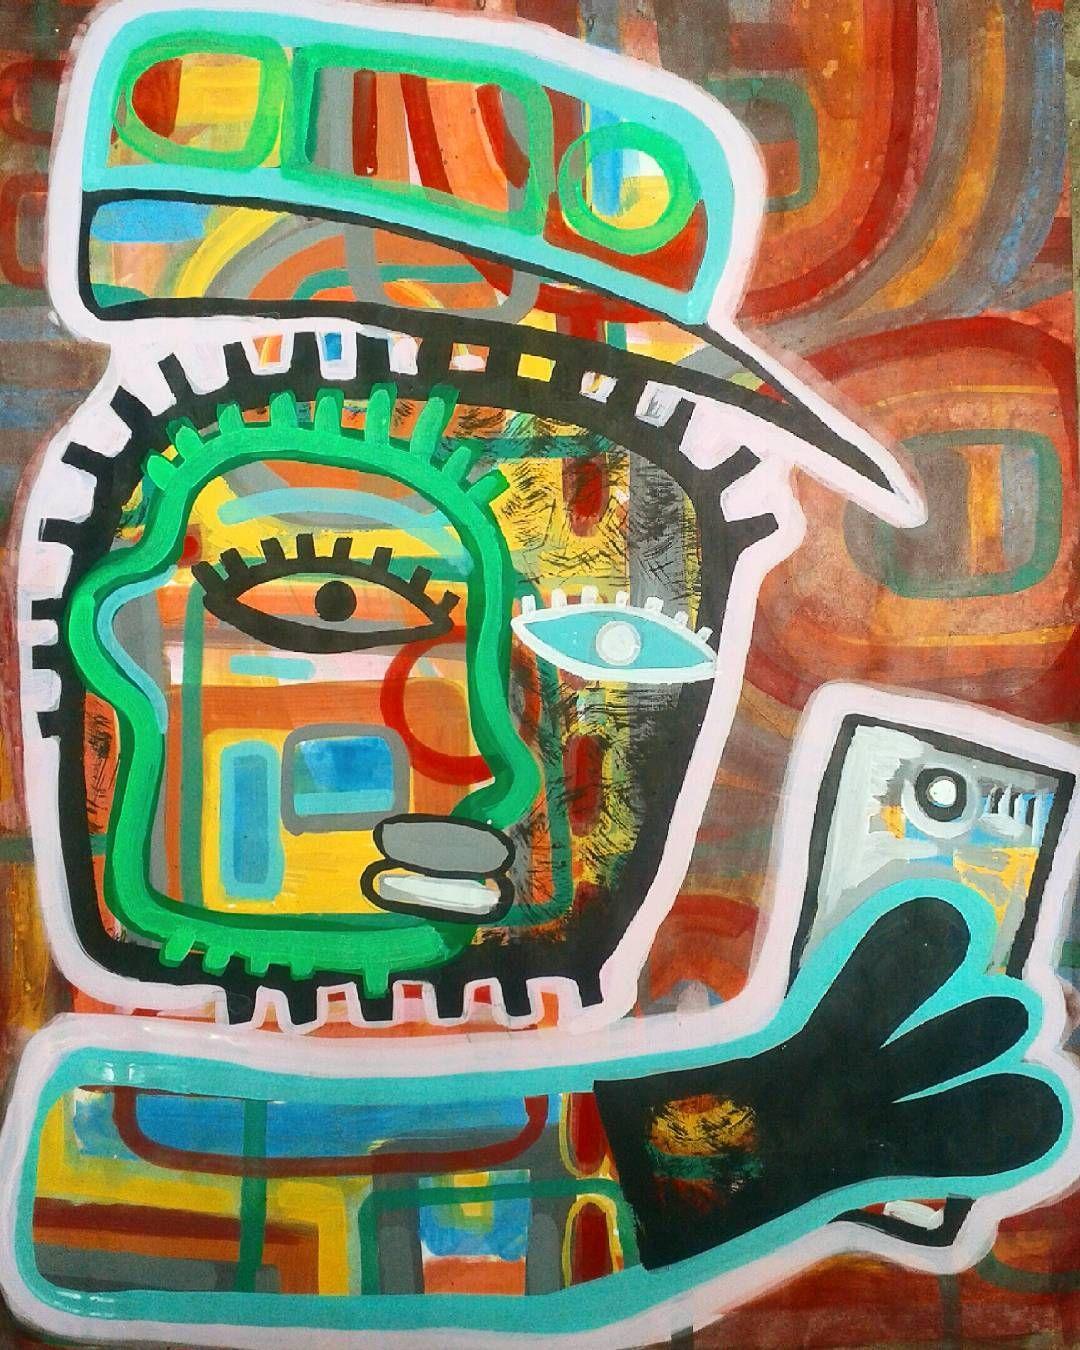 #selfie #arte de Taso Navarro #obradearte hecha en #coyoacan #cdmx #mexico #pintura #ventadearte #artforsale #art #artista #artwork #arty #artgallery #contemporanyart #fineart #artprize #paint #artist #illustration #picture  #artsy #instaart #beautiful #instagood #gallery #masterpiece #instaartist  #artoftheday